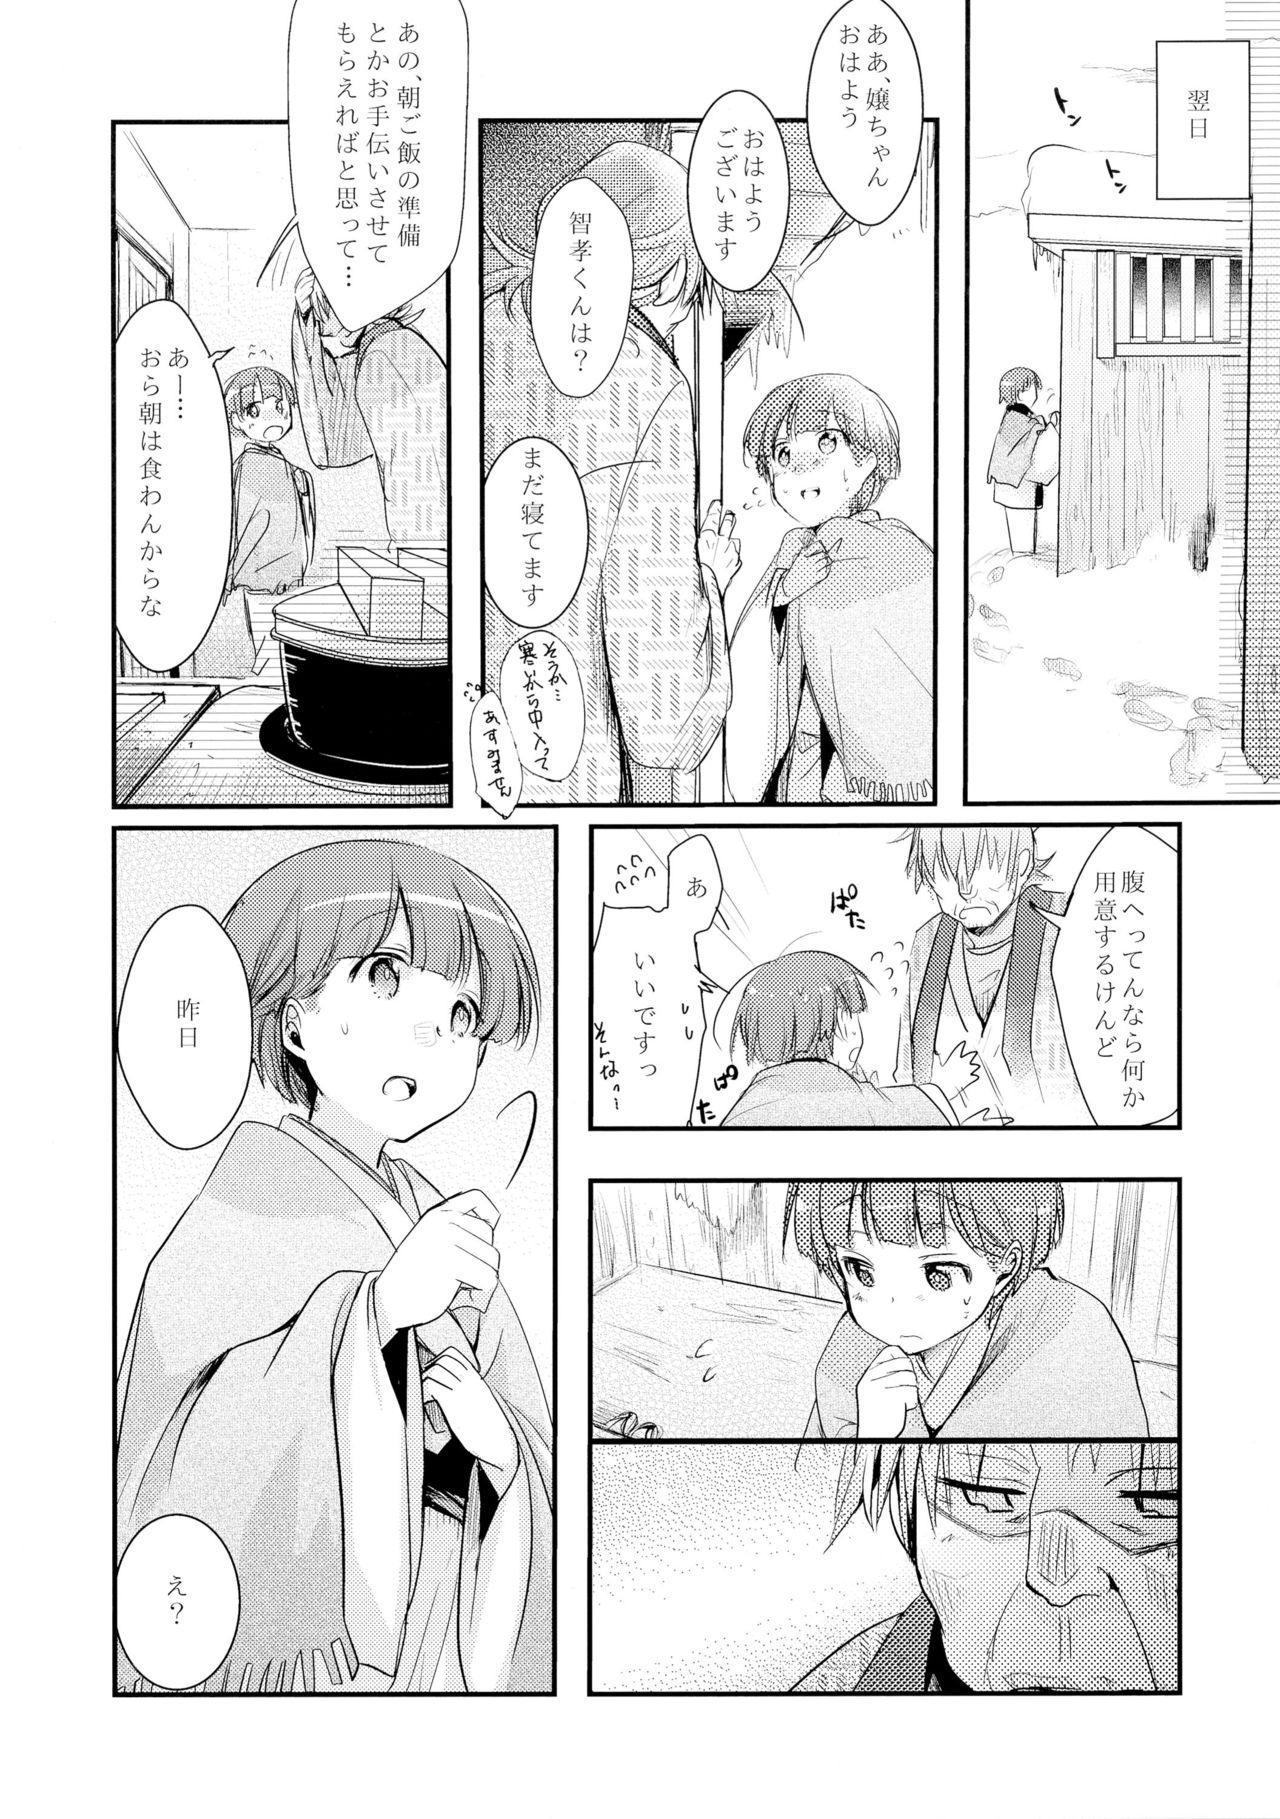 Kakeochi Shoujo Netorare 15